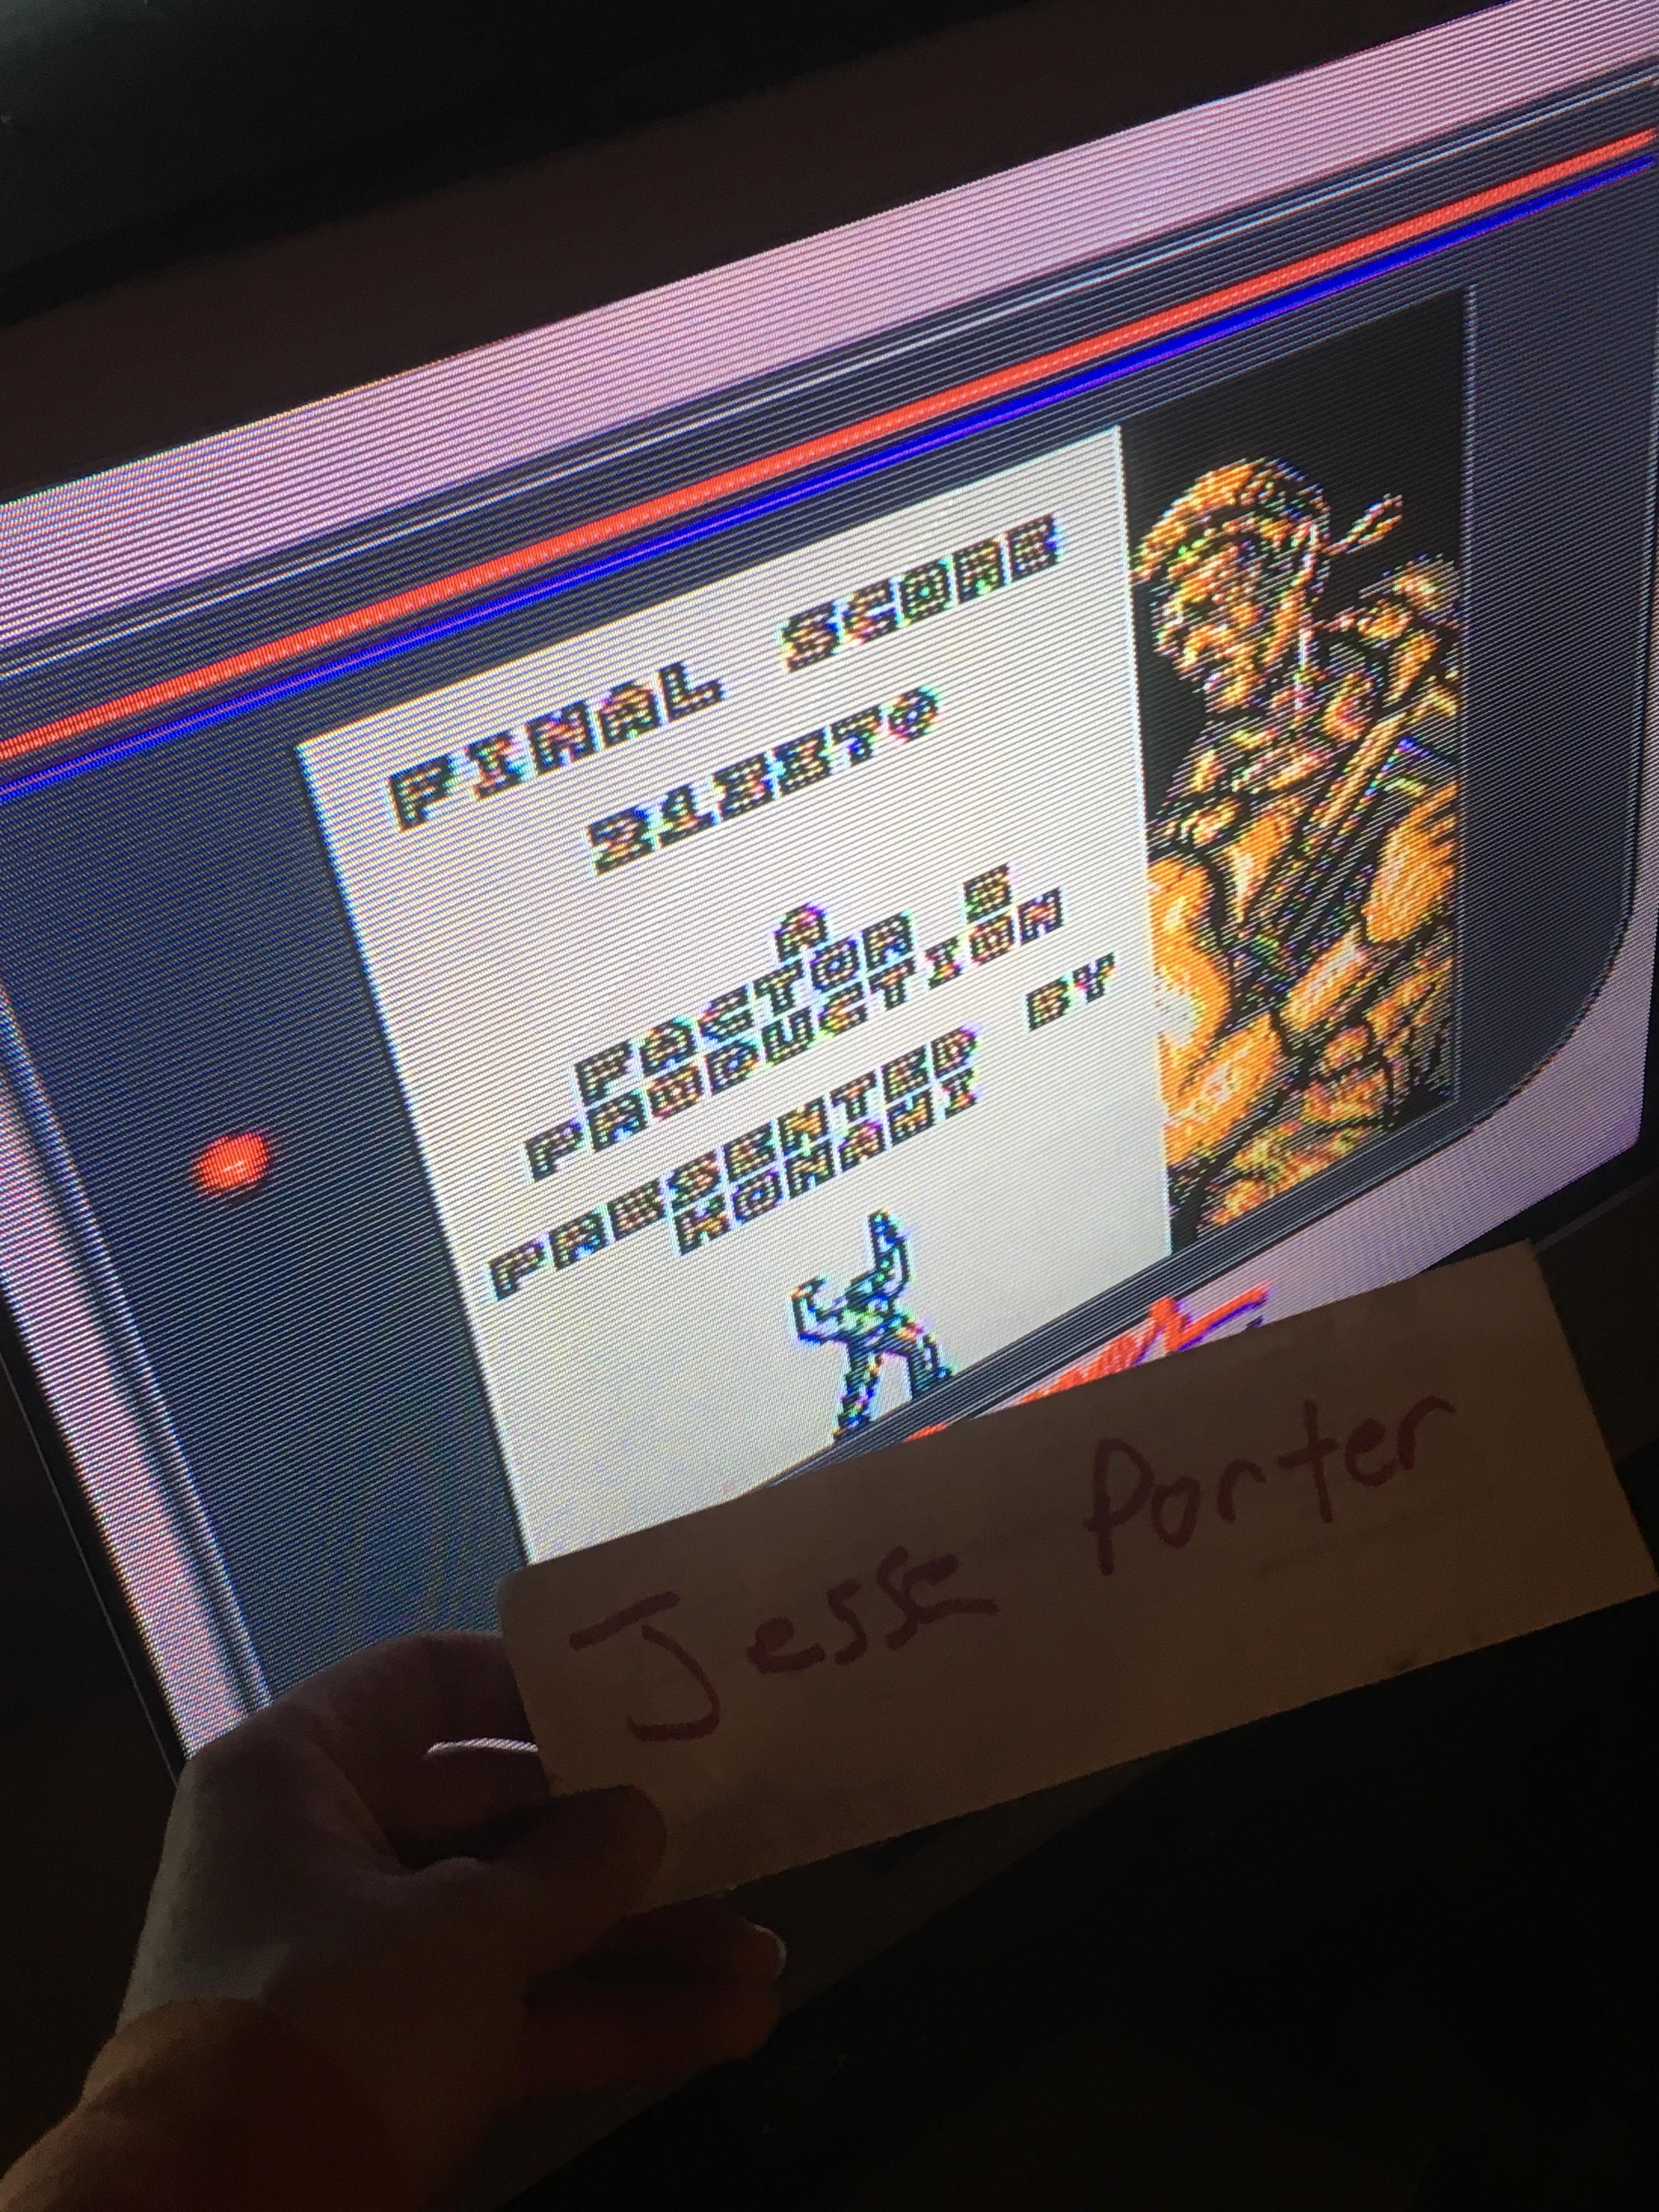 JessePorter: Contra: The Alien Wars (Game Boy) 213,370 points on 2018-01-26 17:41:36